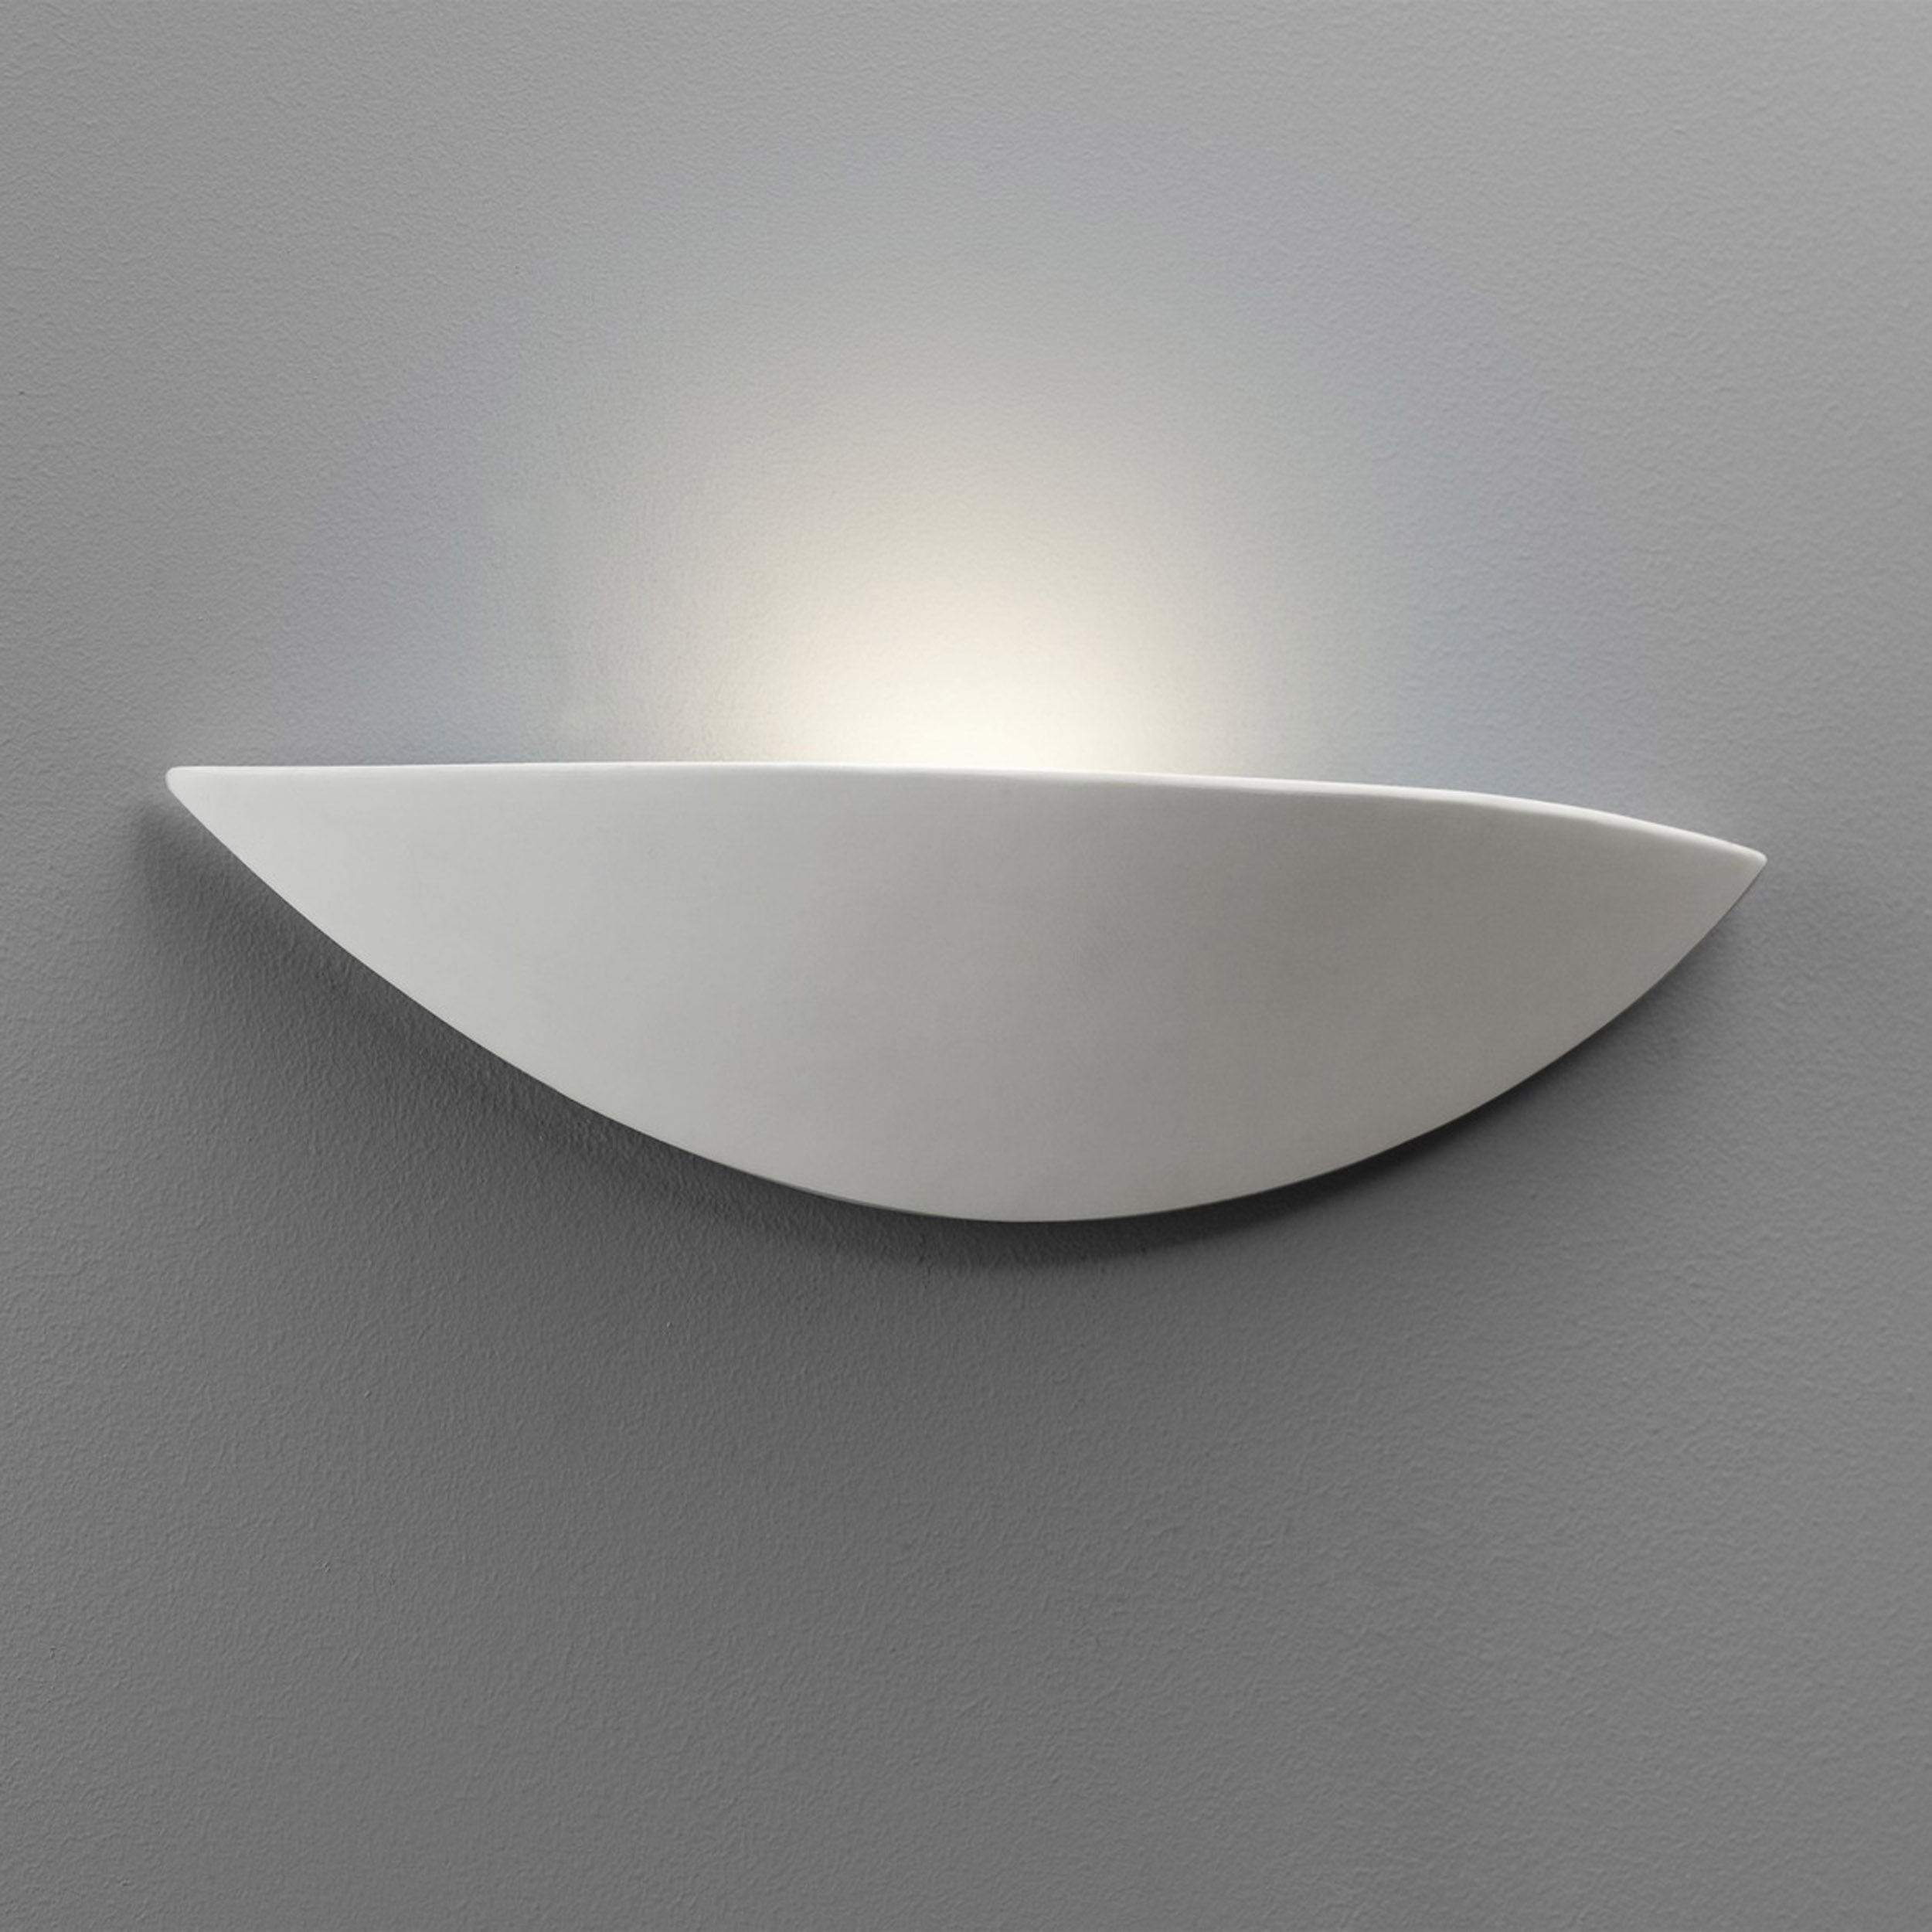 Astro Slice Led Wall Light Ceramic